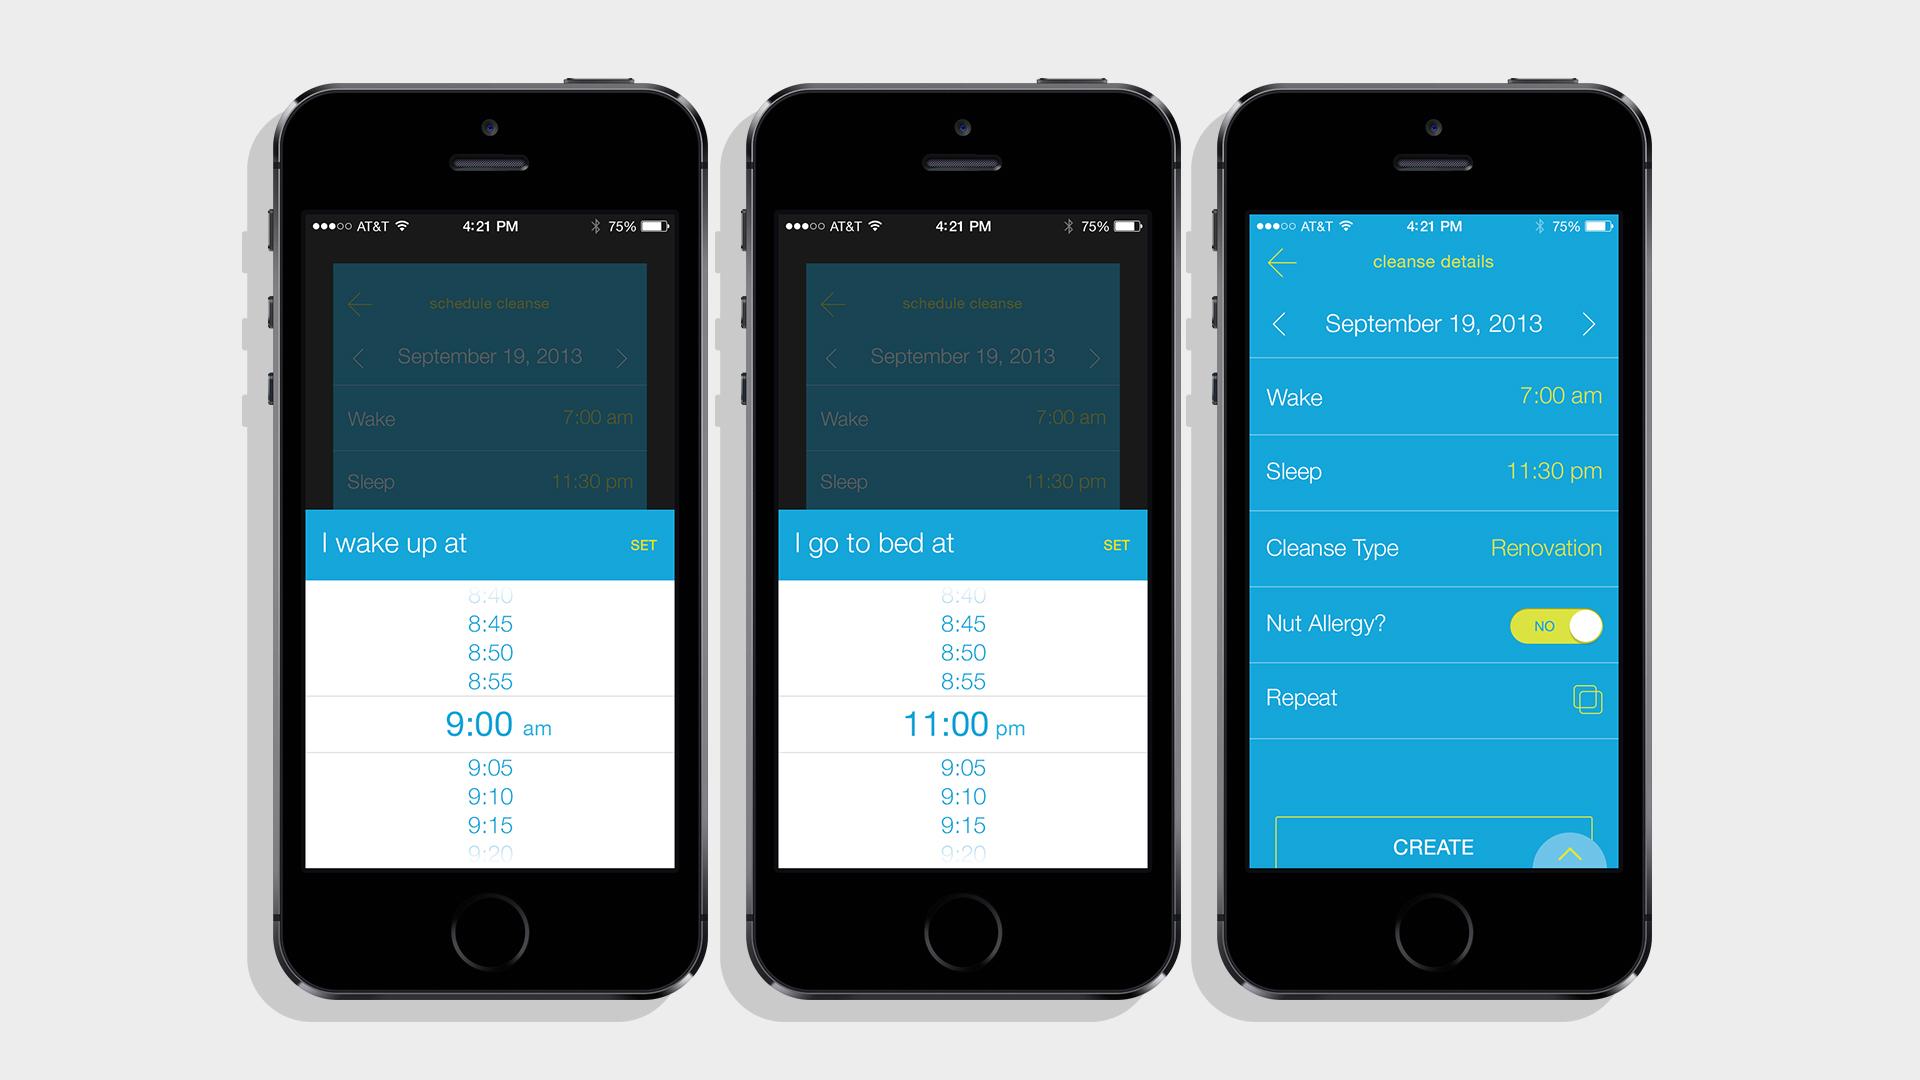 Blueprint mobile app bajibot casetudy00067g malvernweather Image collections